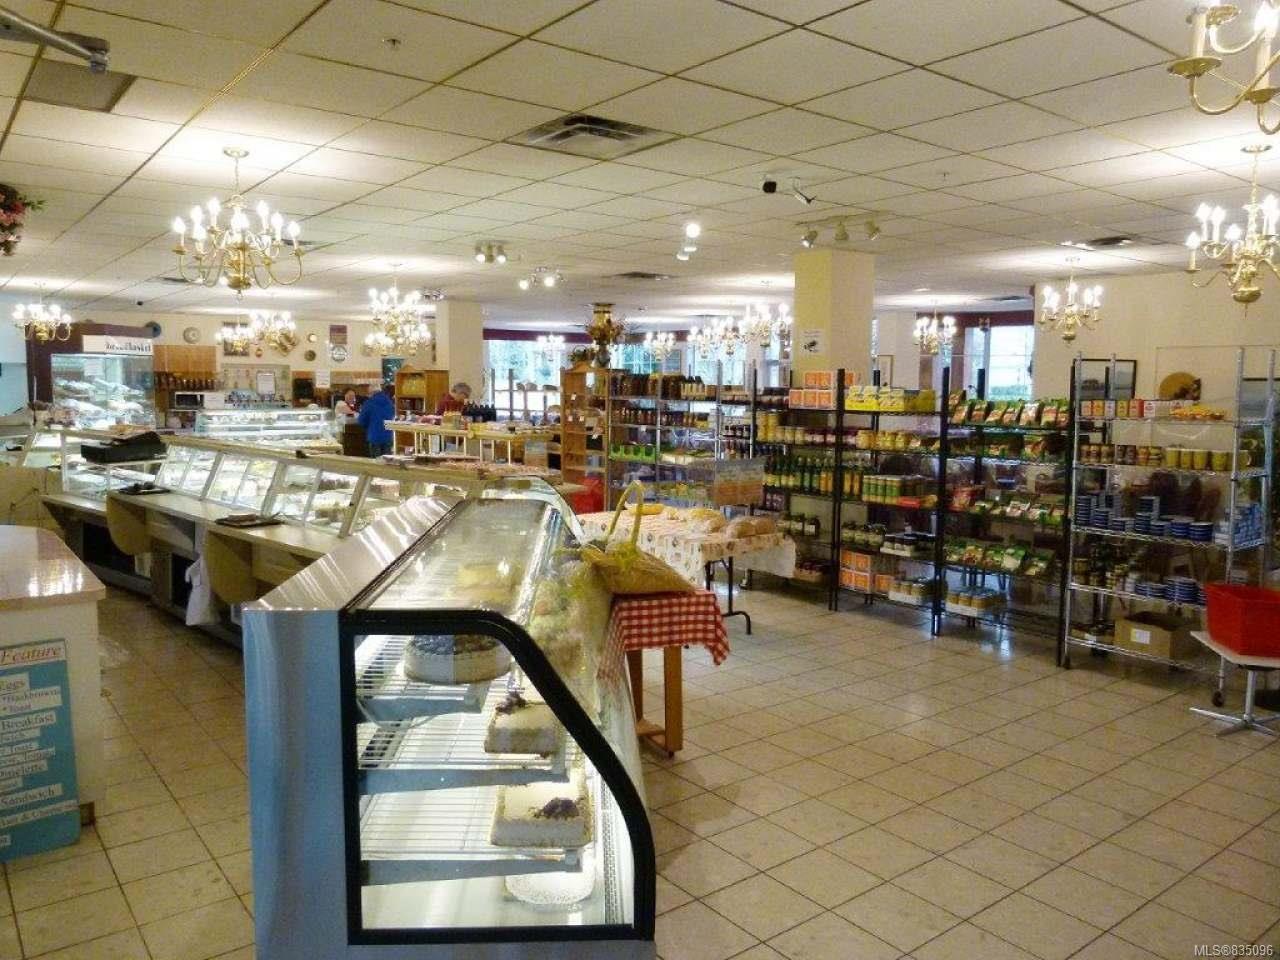 Photo 10: Photos: 2025 Bowen Rd in NANAIMO: Na Central Nanaimo Mixed Use for sale (Nanaimo)  : MLS®# 835096